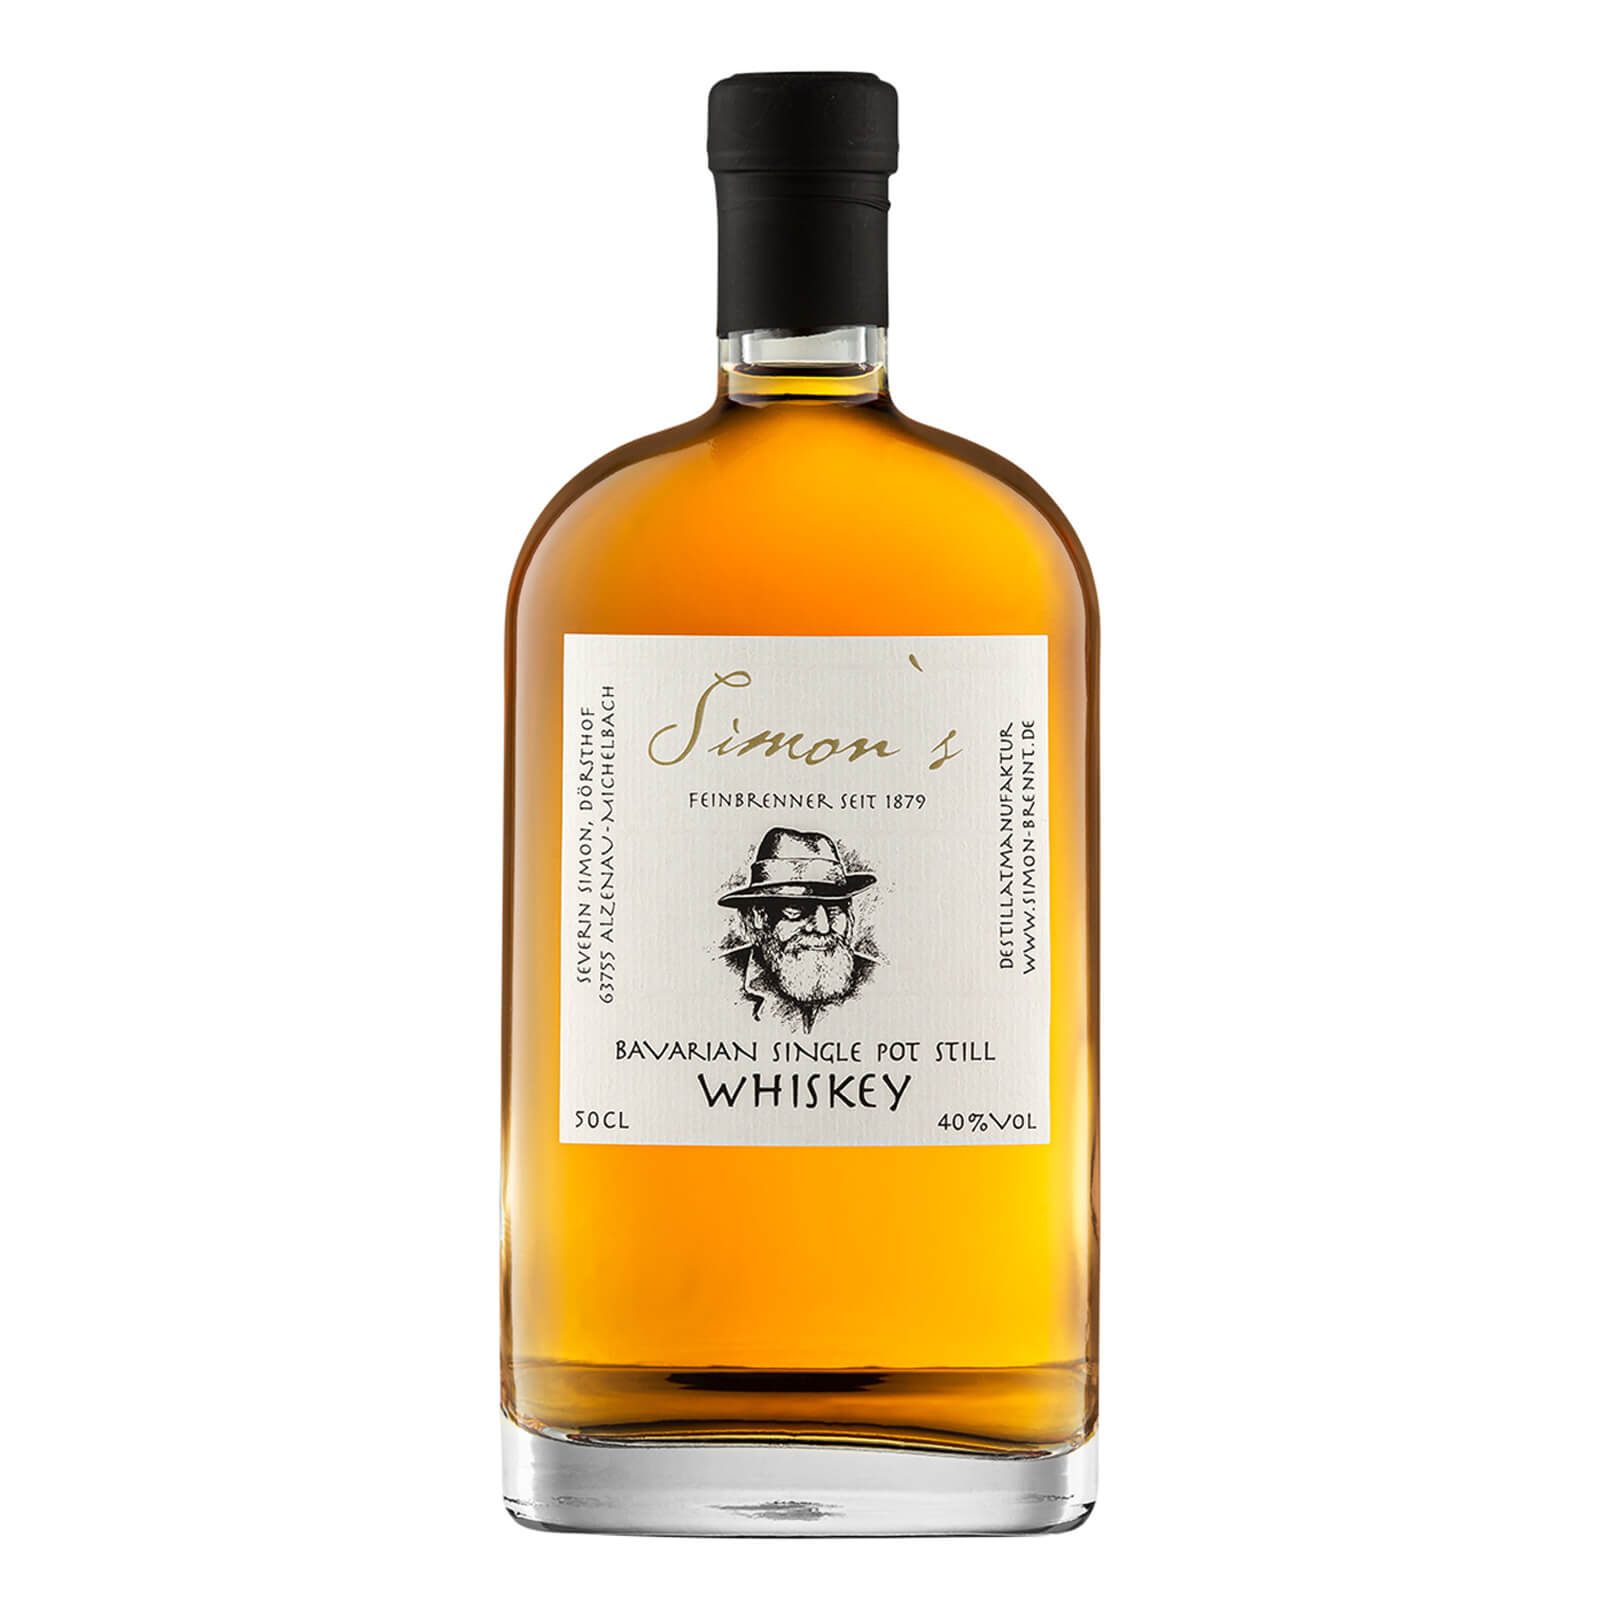 Simon's Bavarian Single Pot Still Whiskey